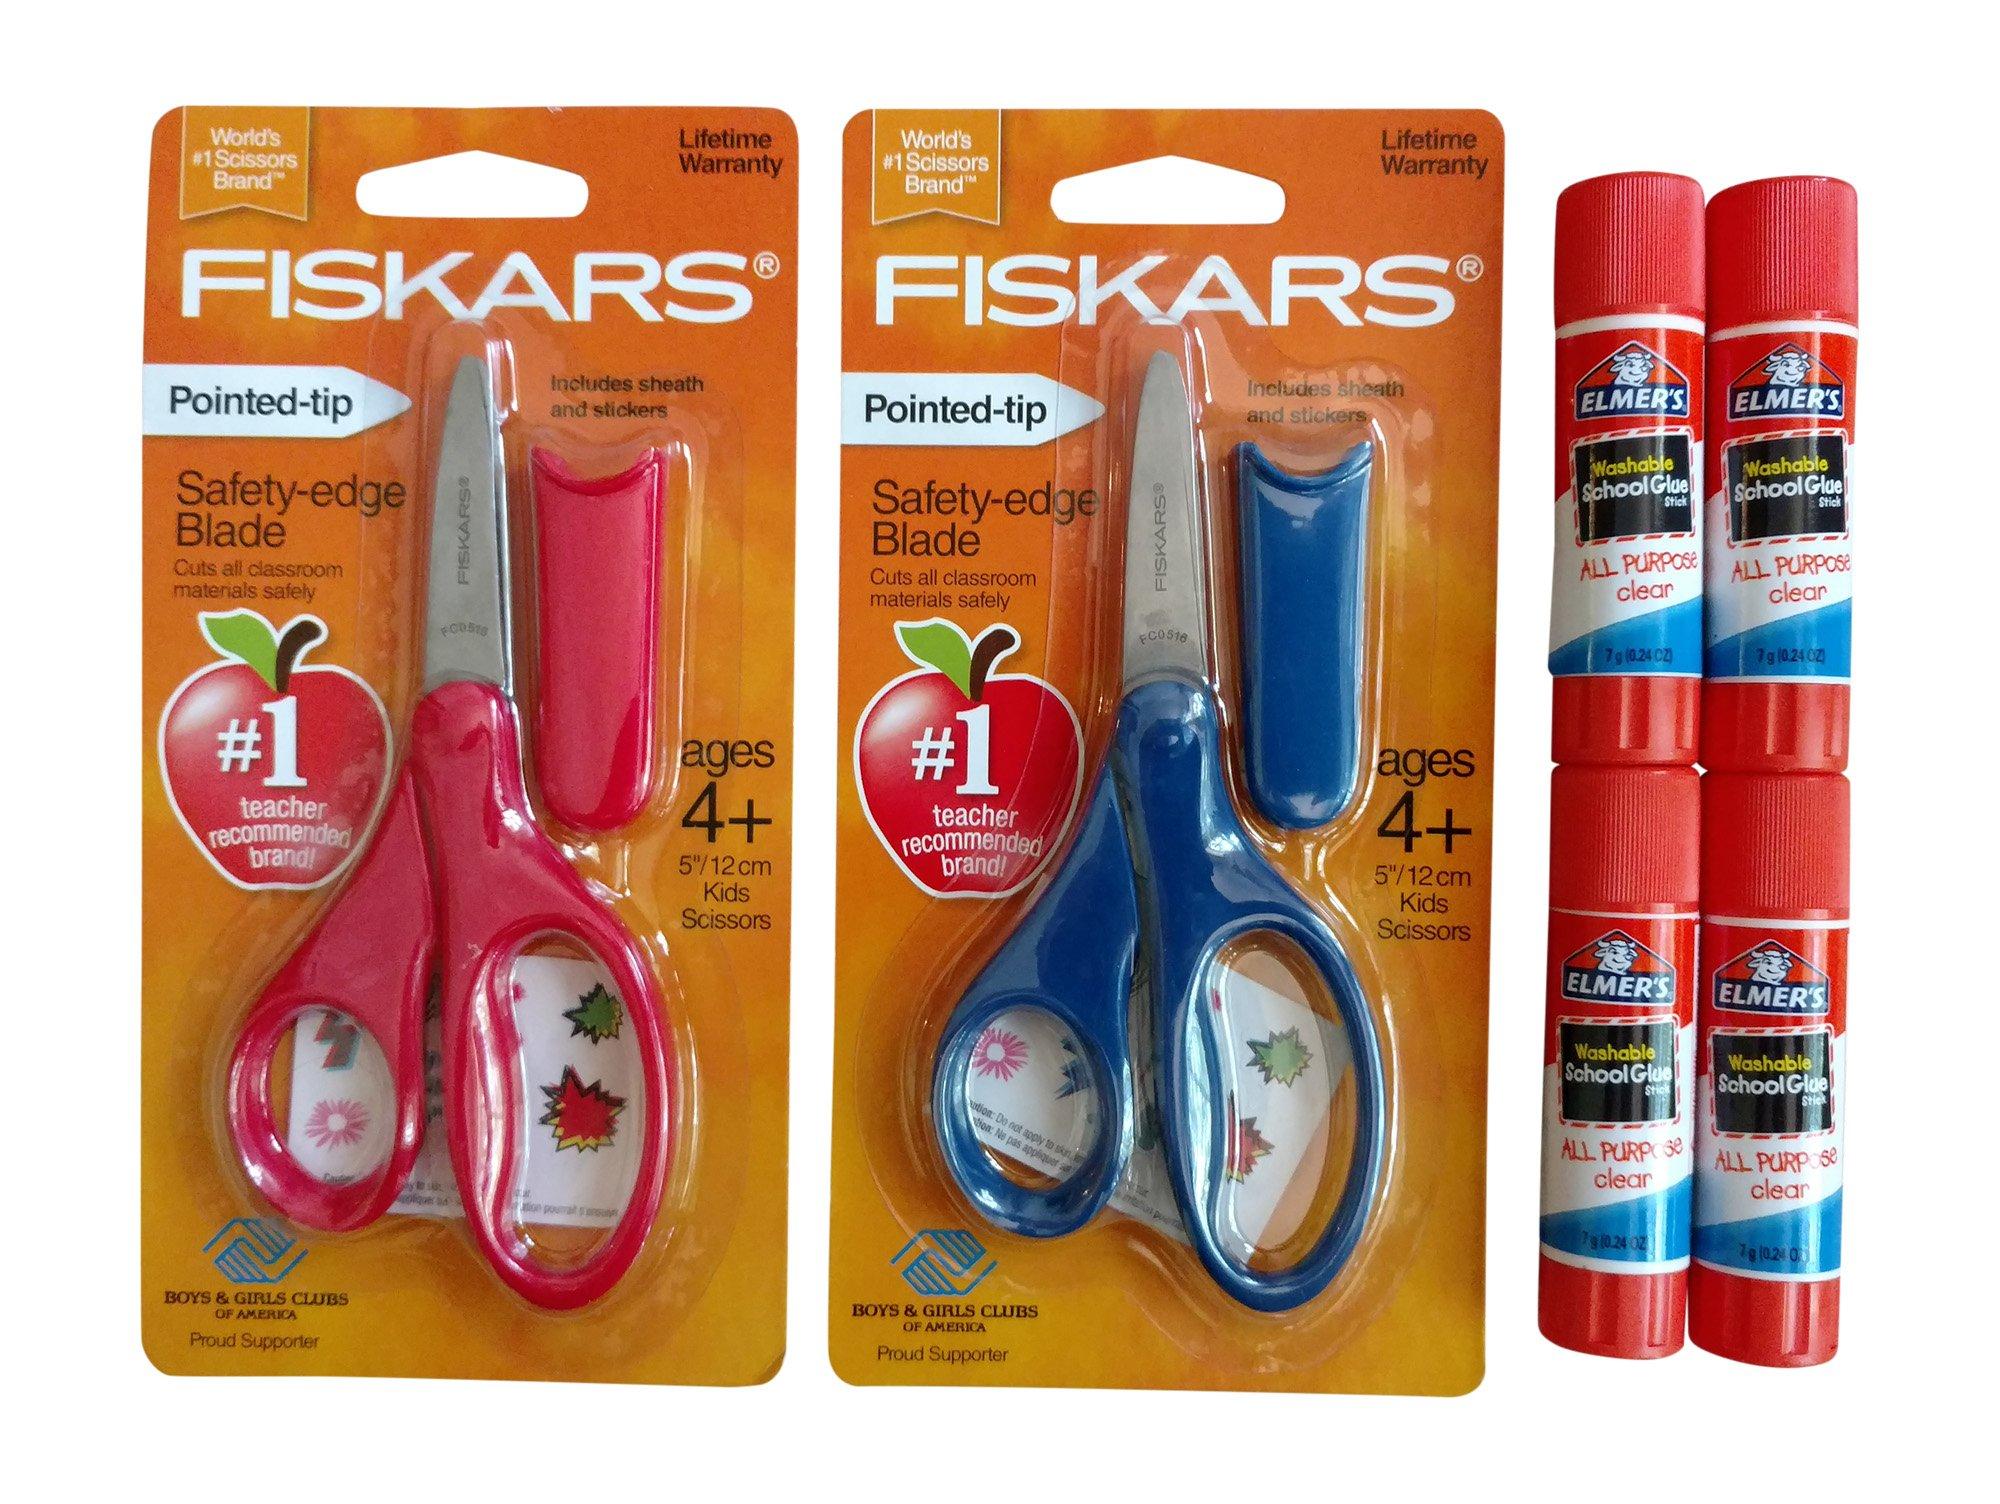 School Supplies Bundle: Fiskars 5'' Pointed-Tip Kid Scissors with Sheath - Set of 2 & Elmer's Glue Sticks - Set of 4 (Dark Blue & Red)